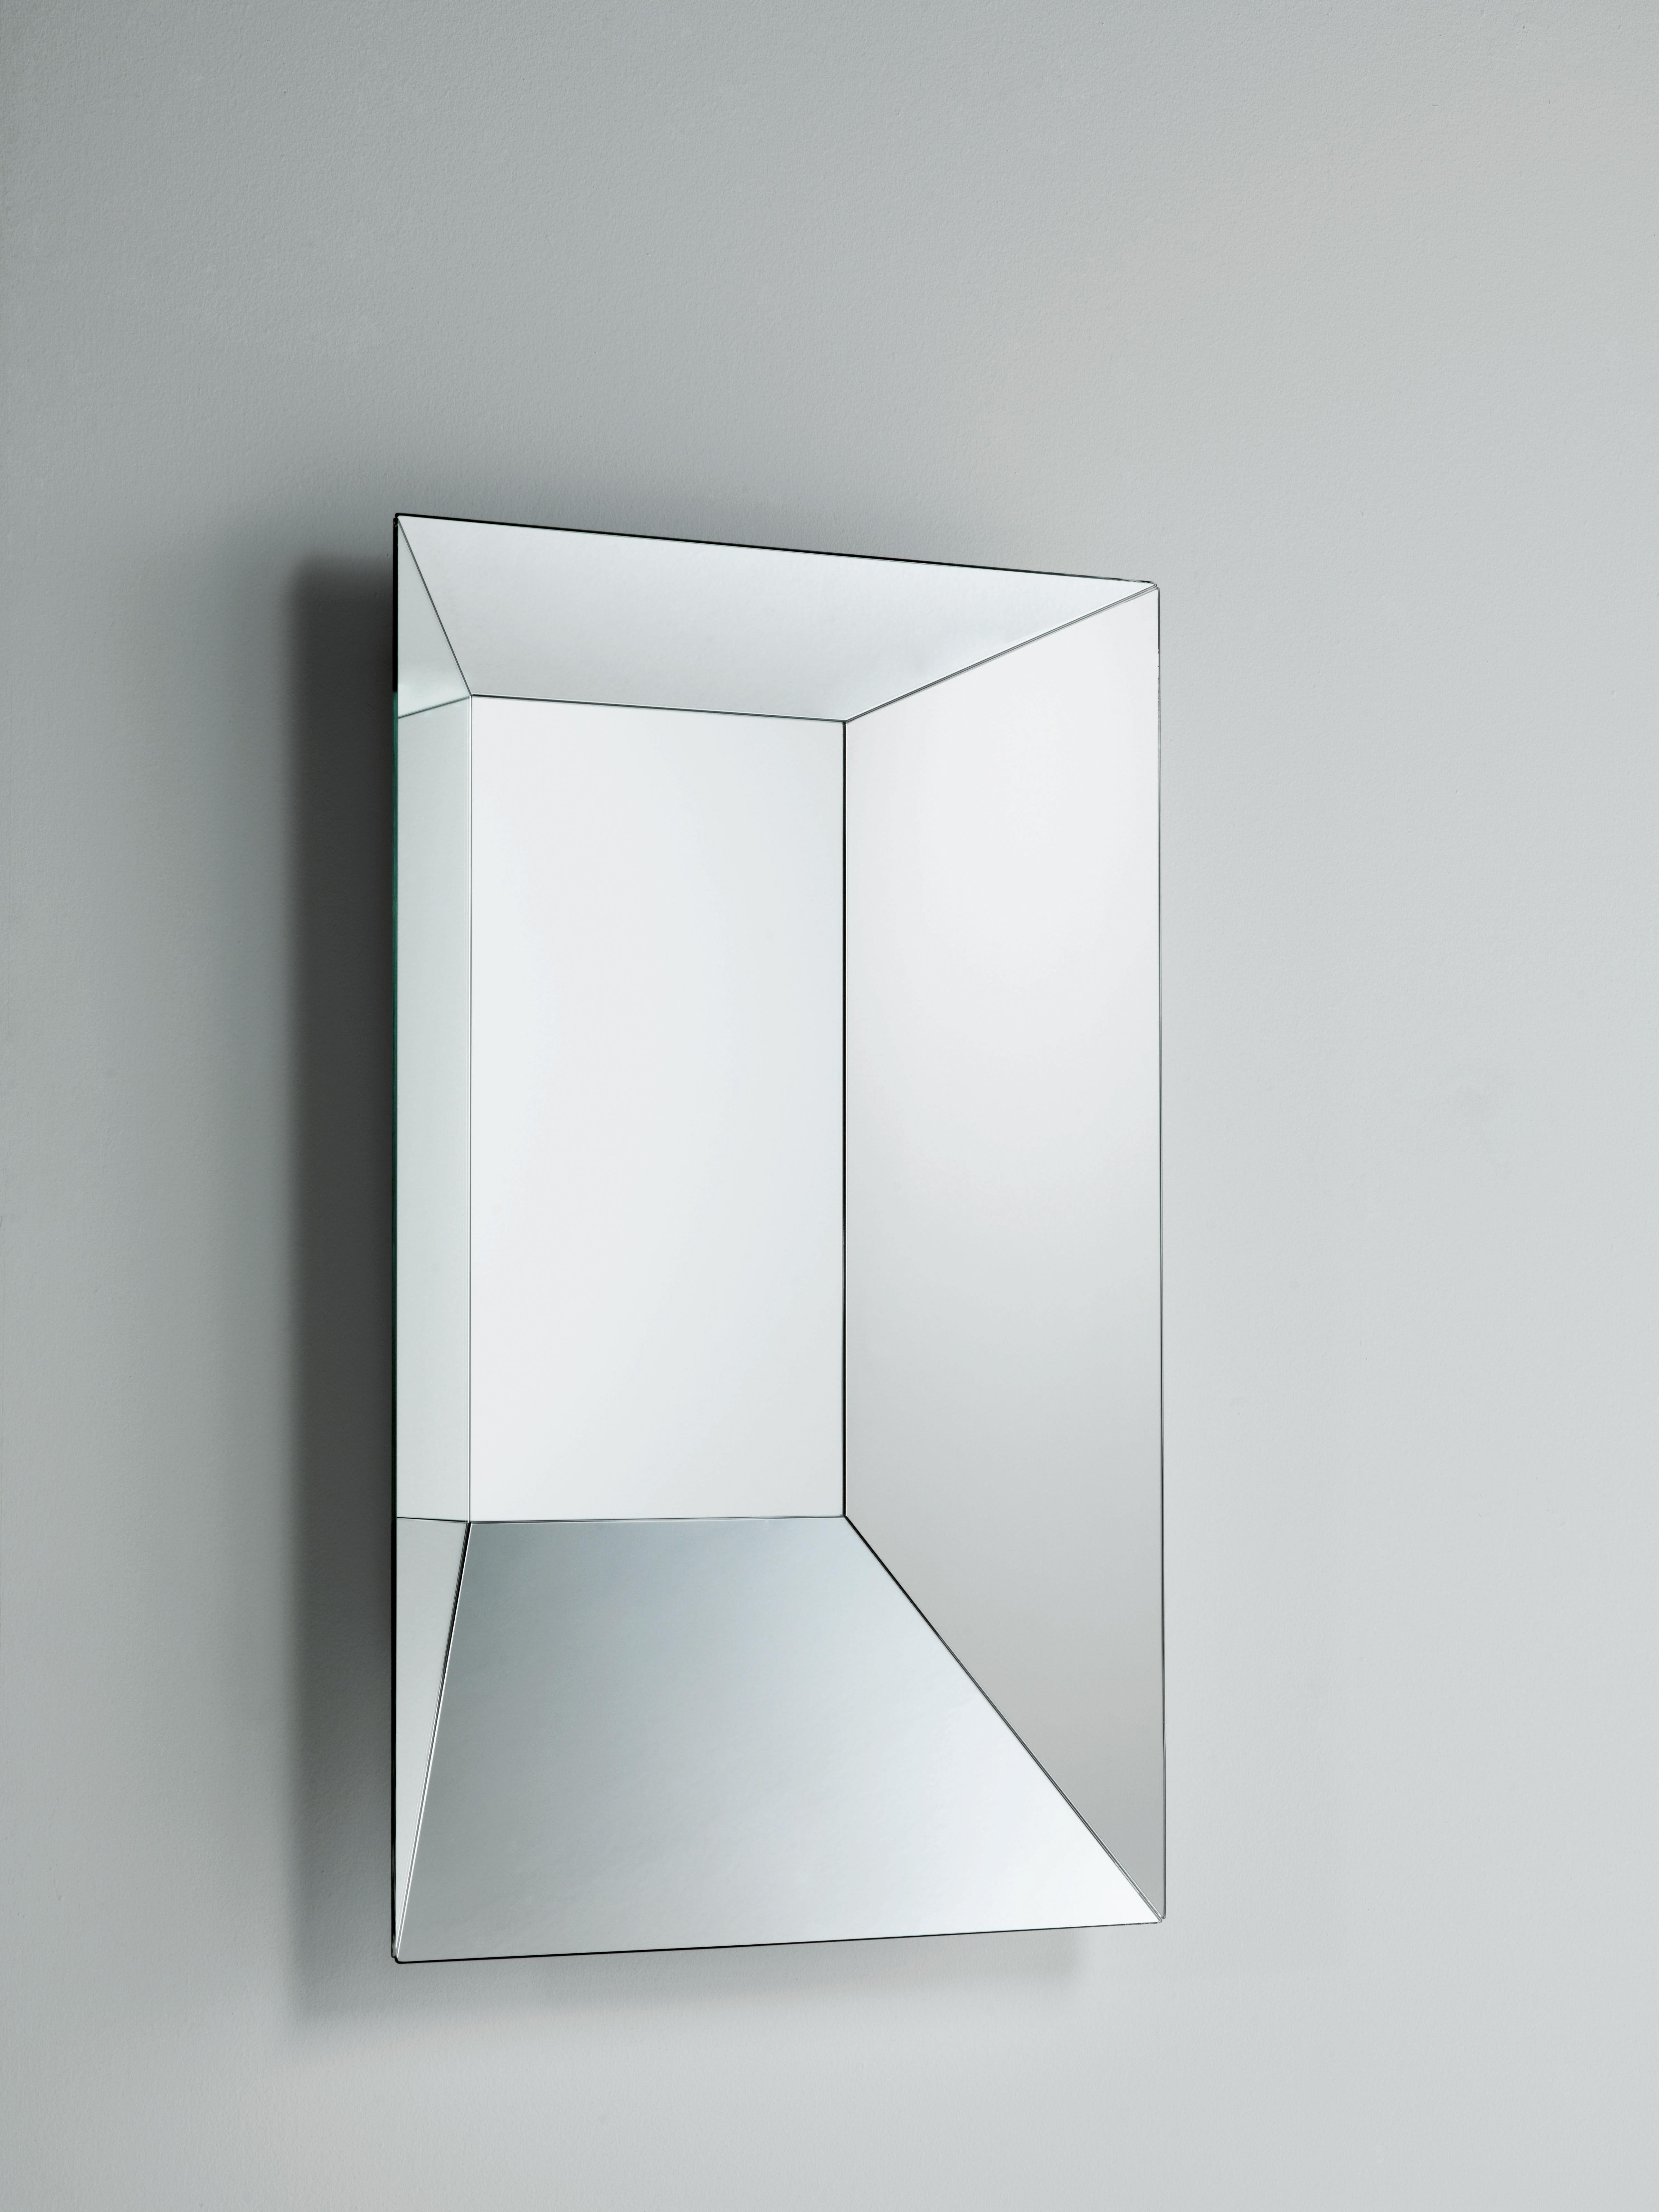 Miroir leon battista 50 x h 70 cm 50 x 70 cm glas italia for Miroir 70 cm